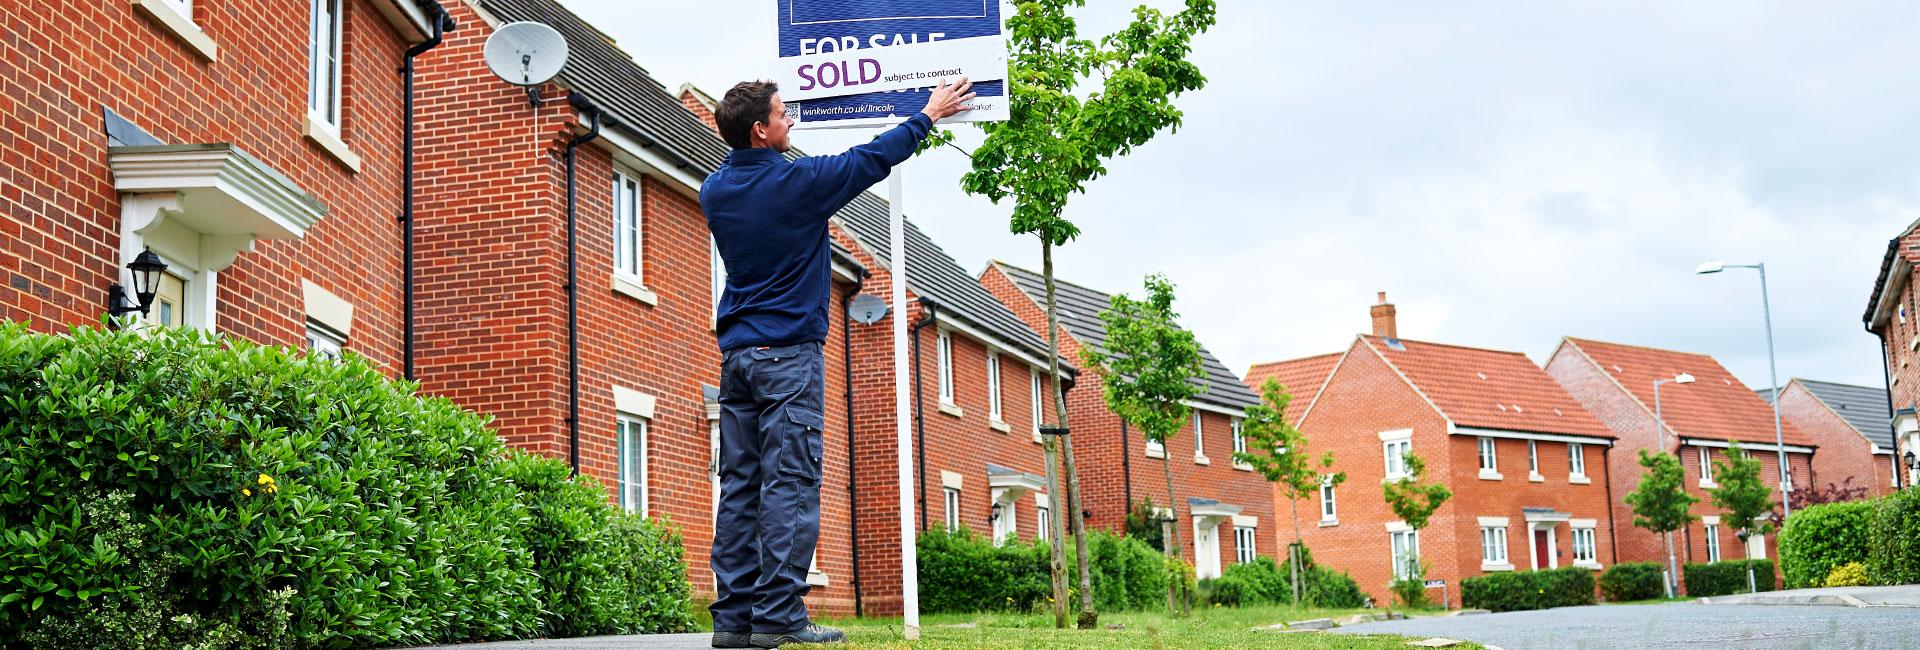 UK Property market report. Property Activity Index